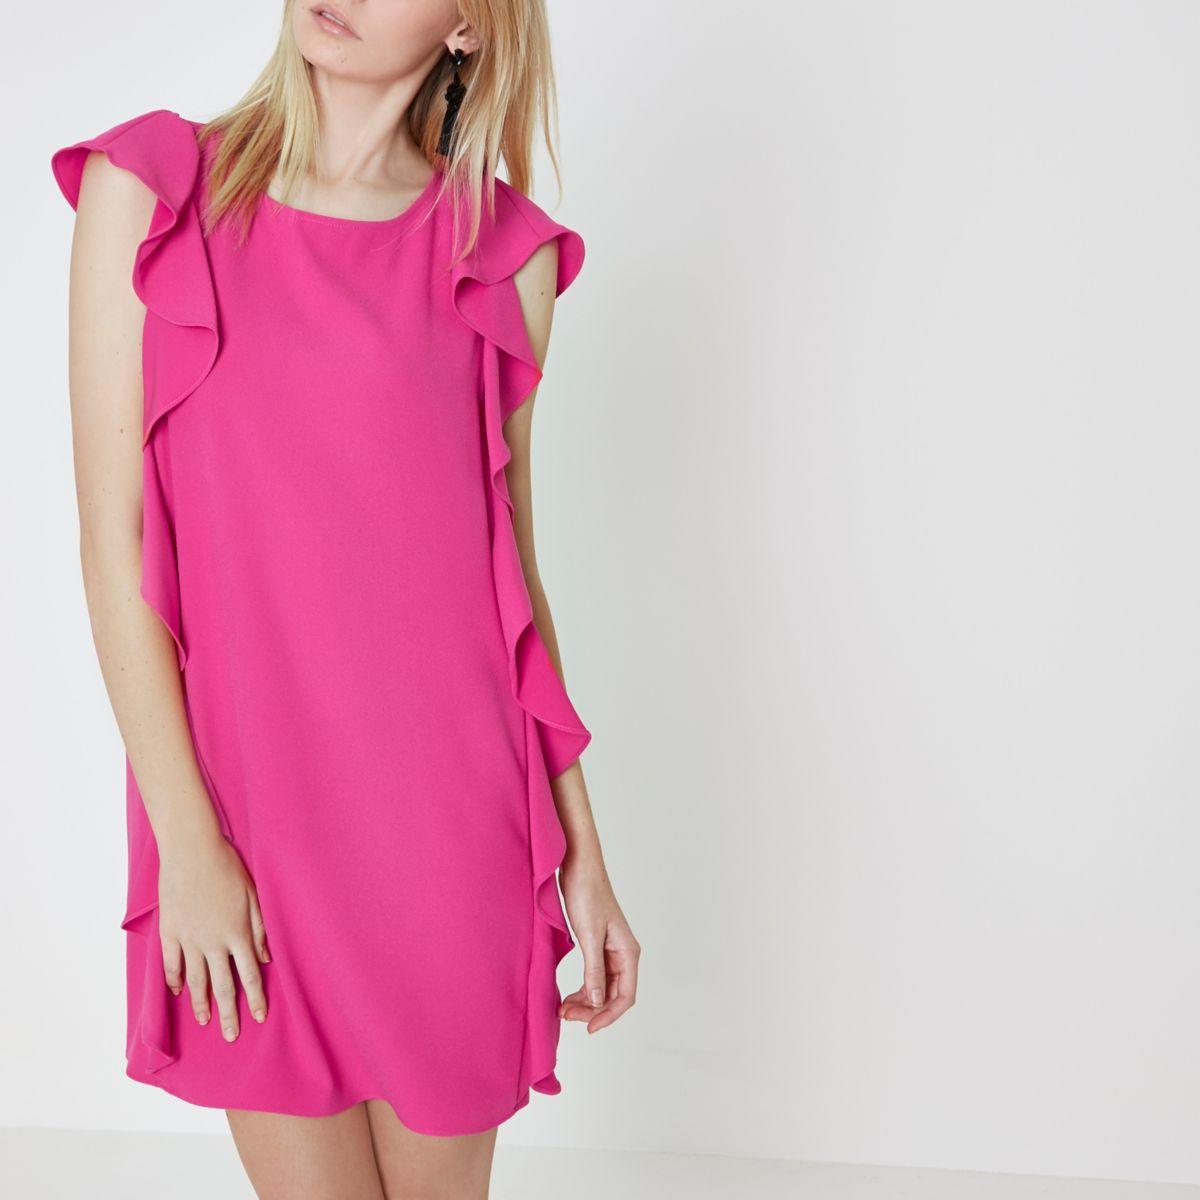 Bright pink frill side sleeveless swing dress